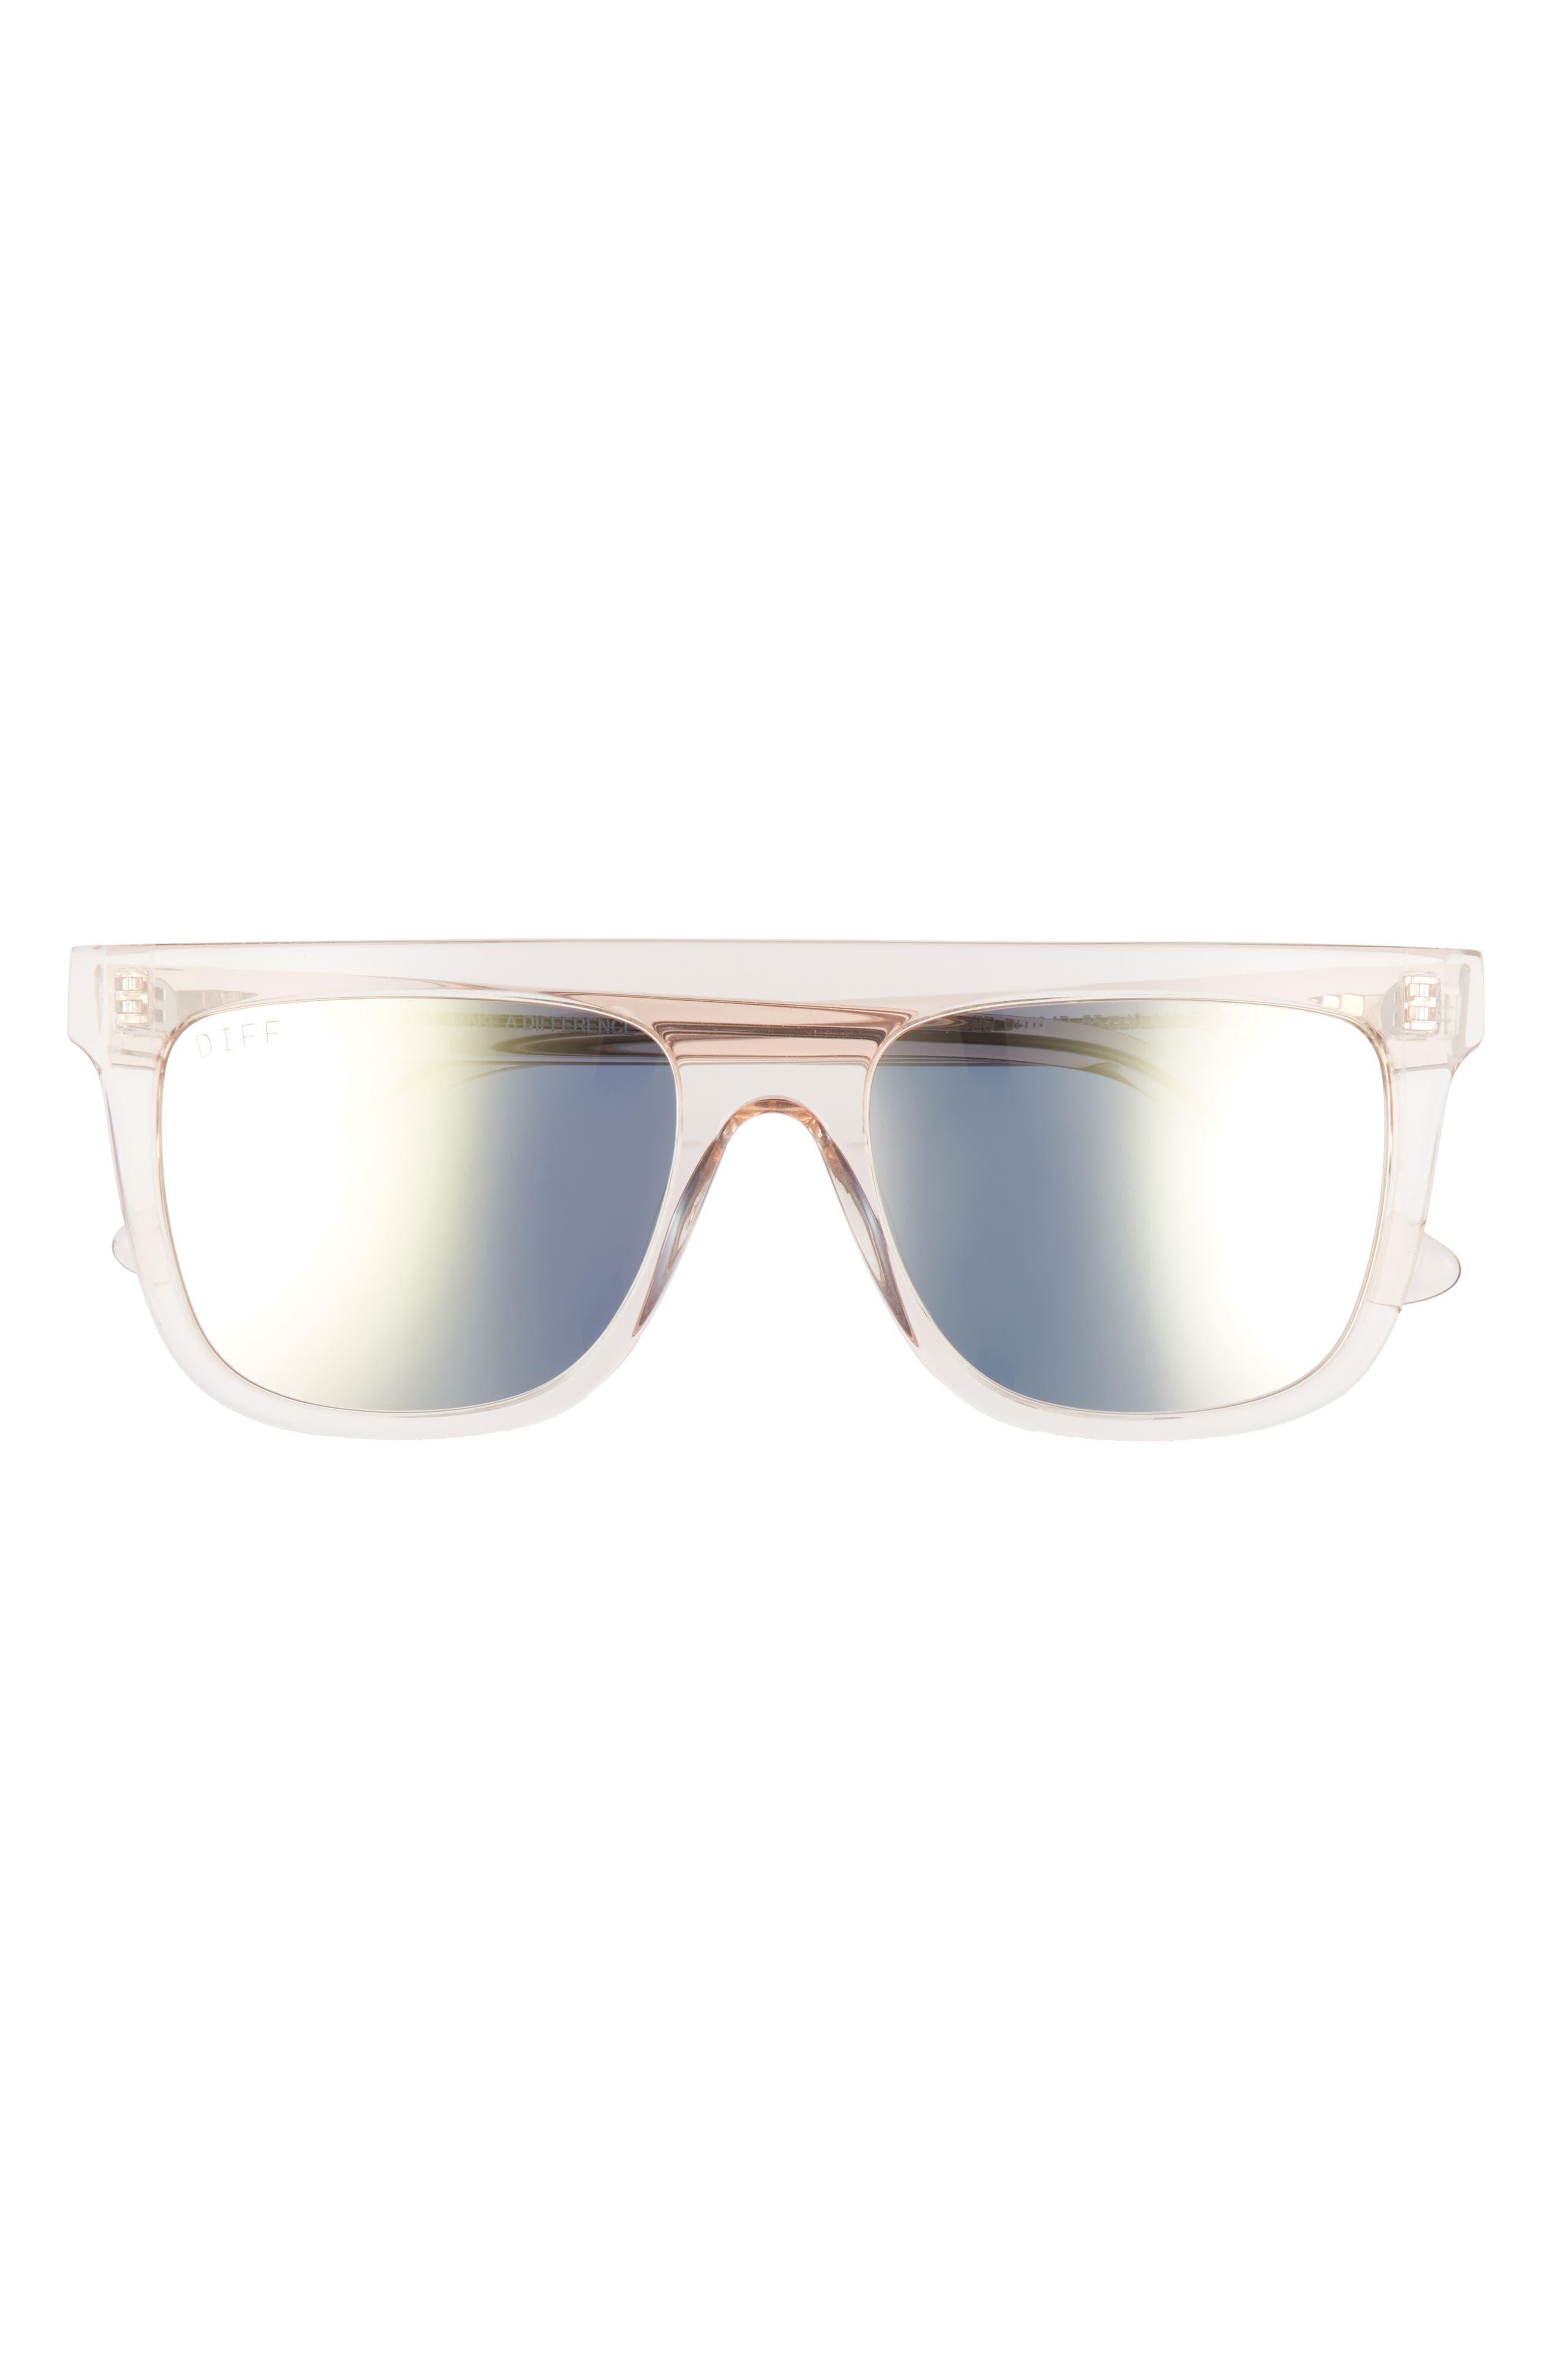 Stevie 55mm Polarized Flat Top Sunglasses